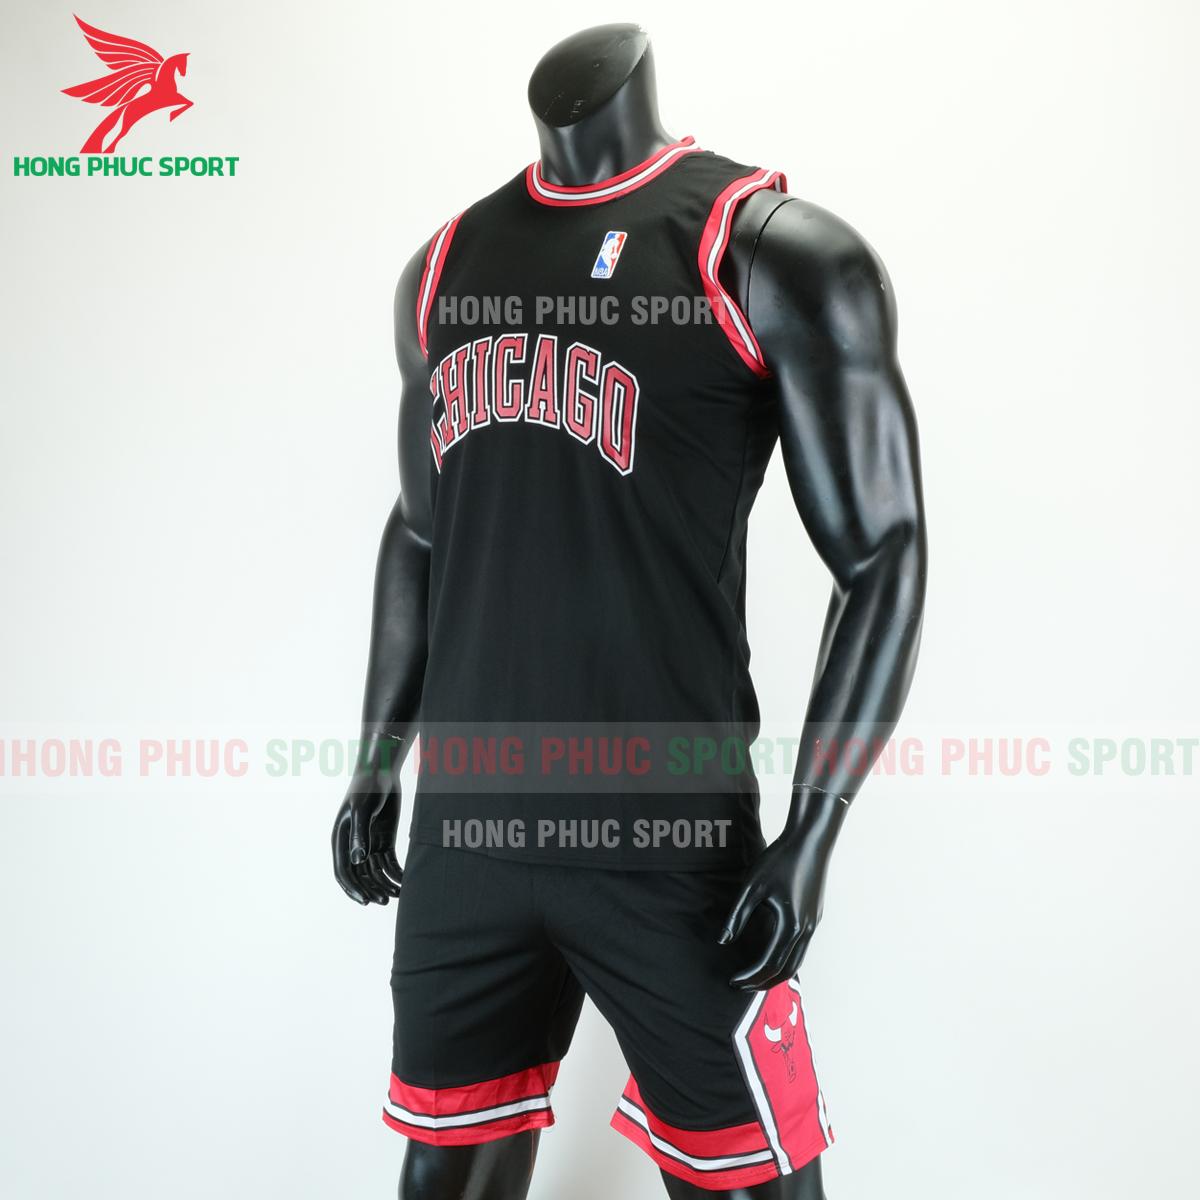 https://cdn.hongphucsport.com/unsafe/s4.shopbay.vn/files/285/ao-bong-ro-bulls-mau-den-4-5f76dccea5b78.png